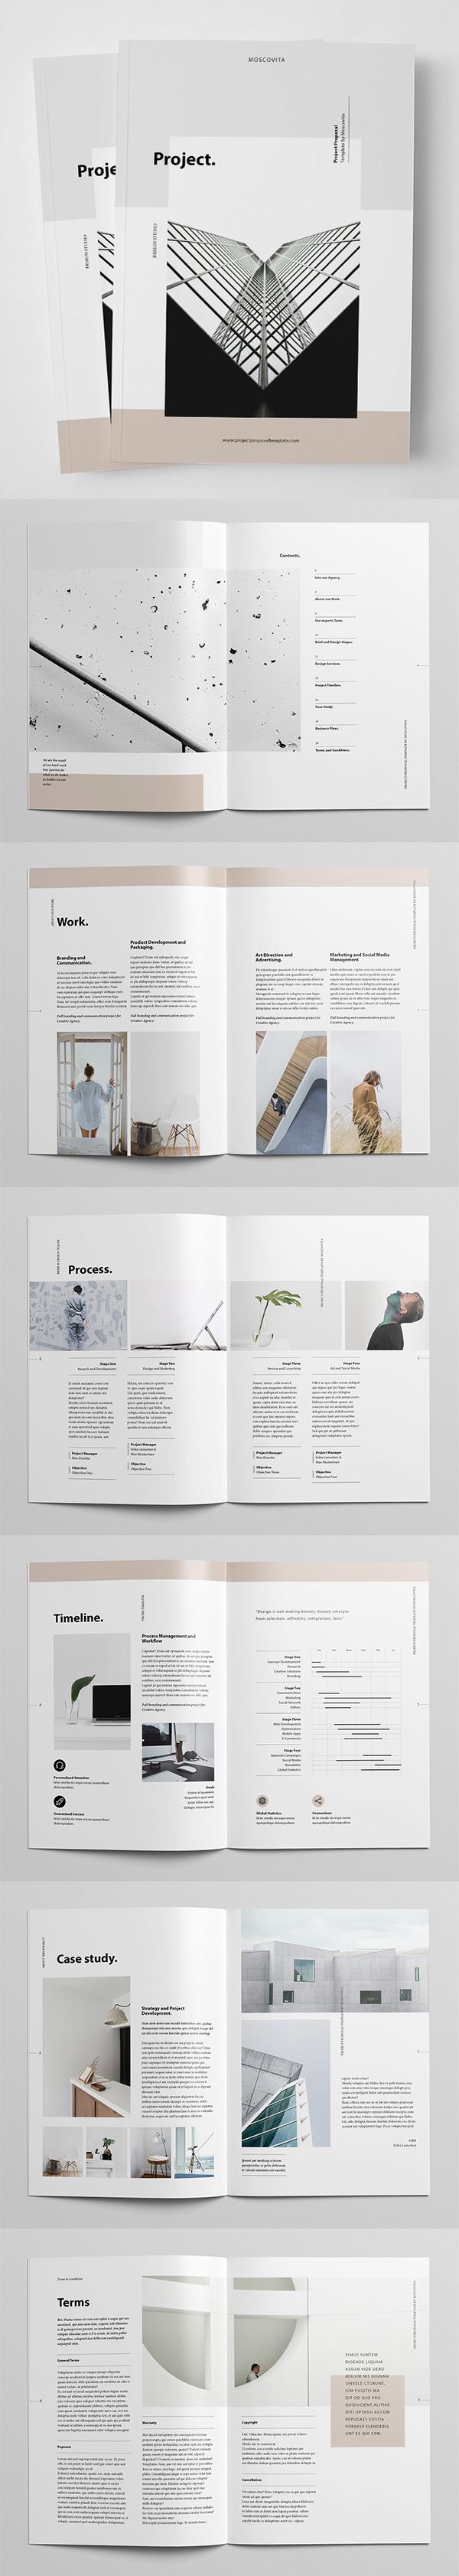 Professional Business Proposal Templates Design - 5